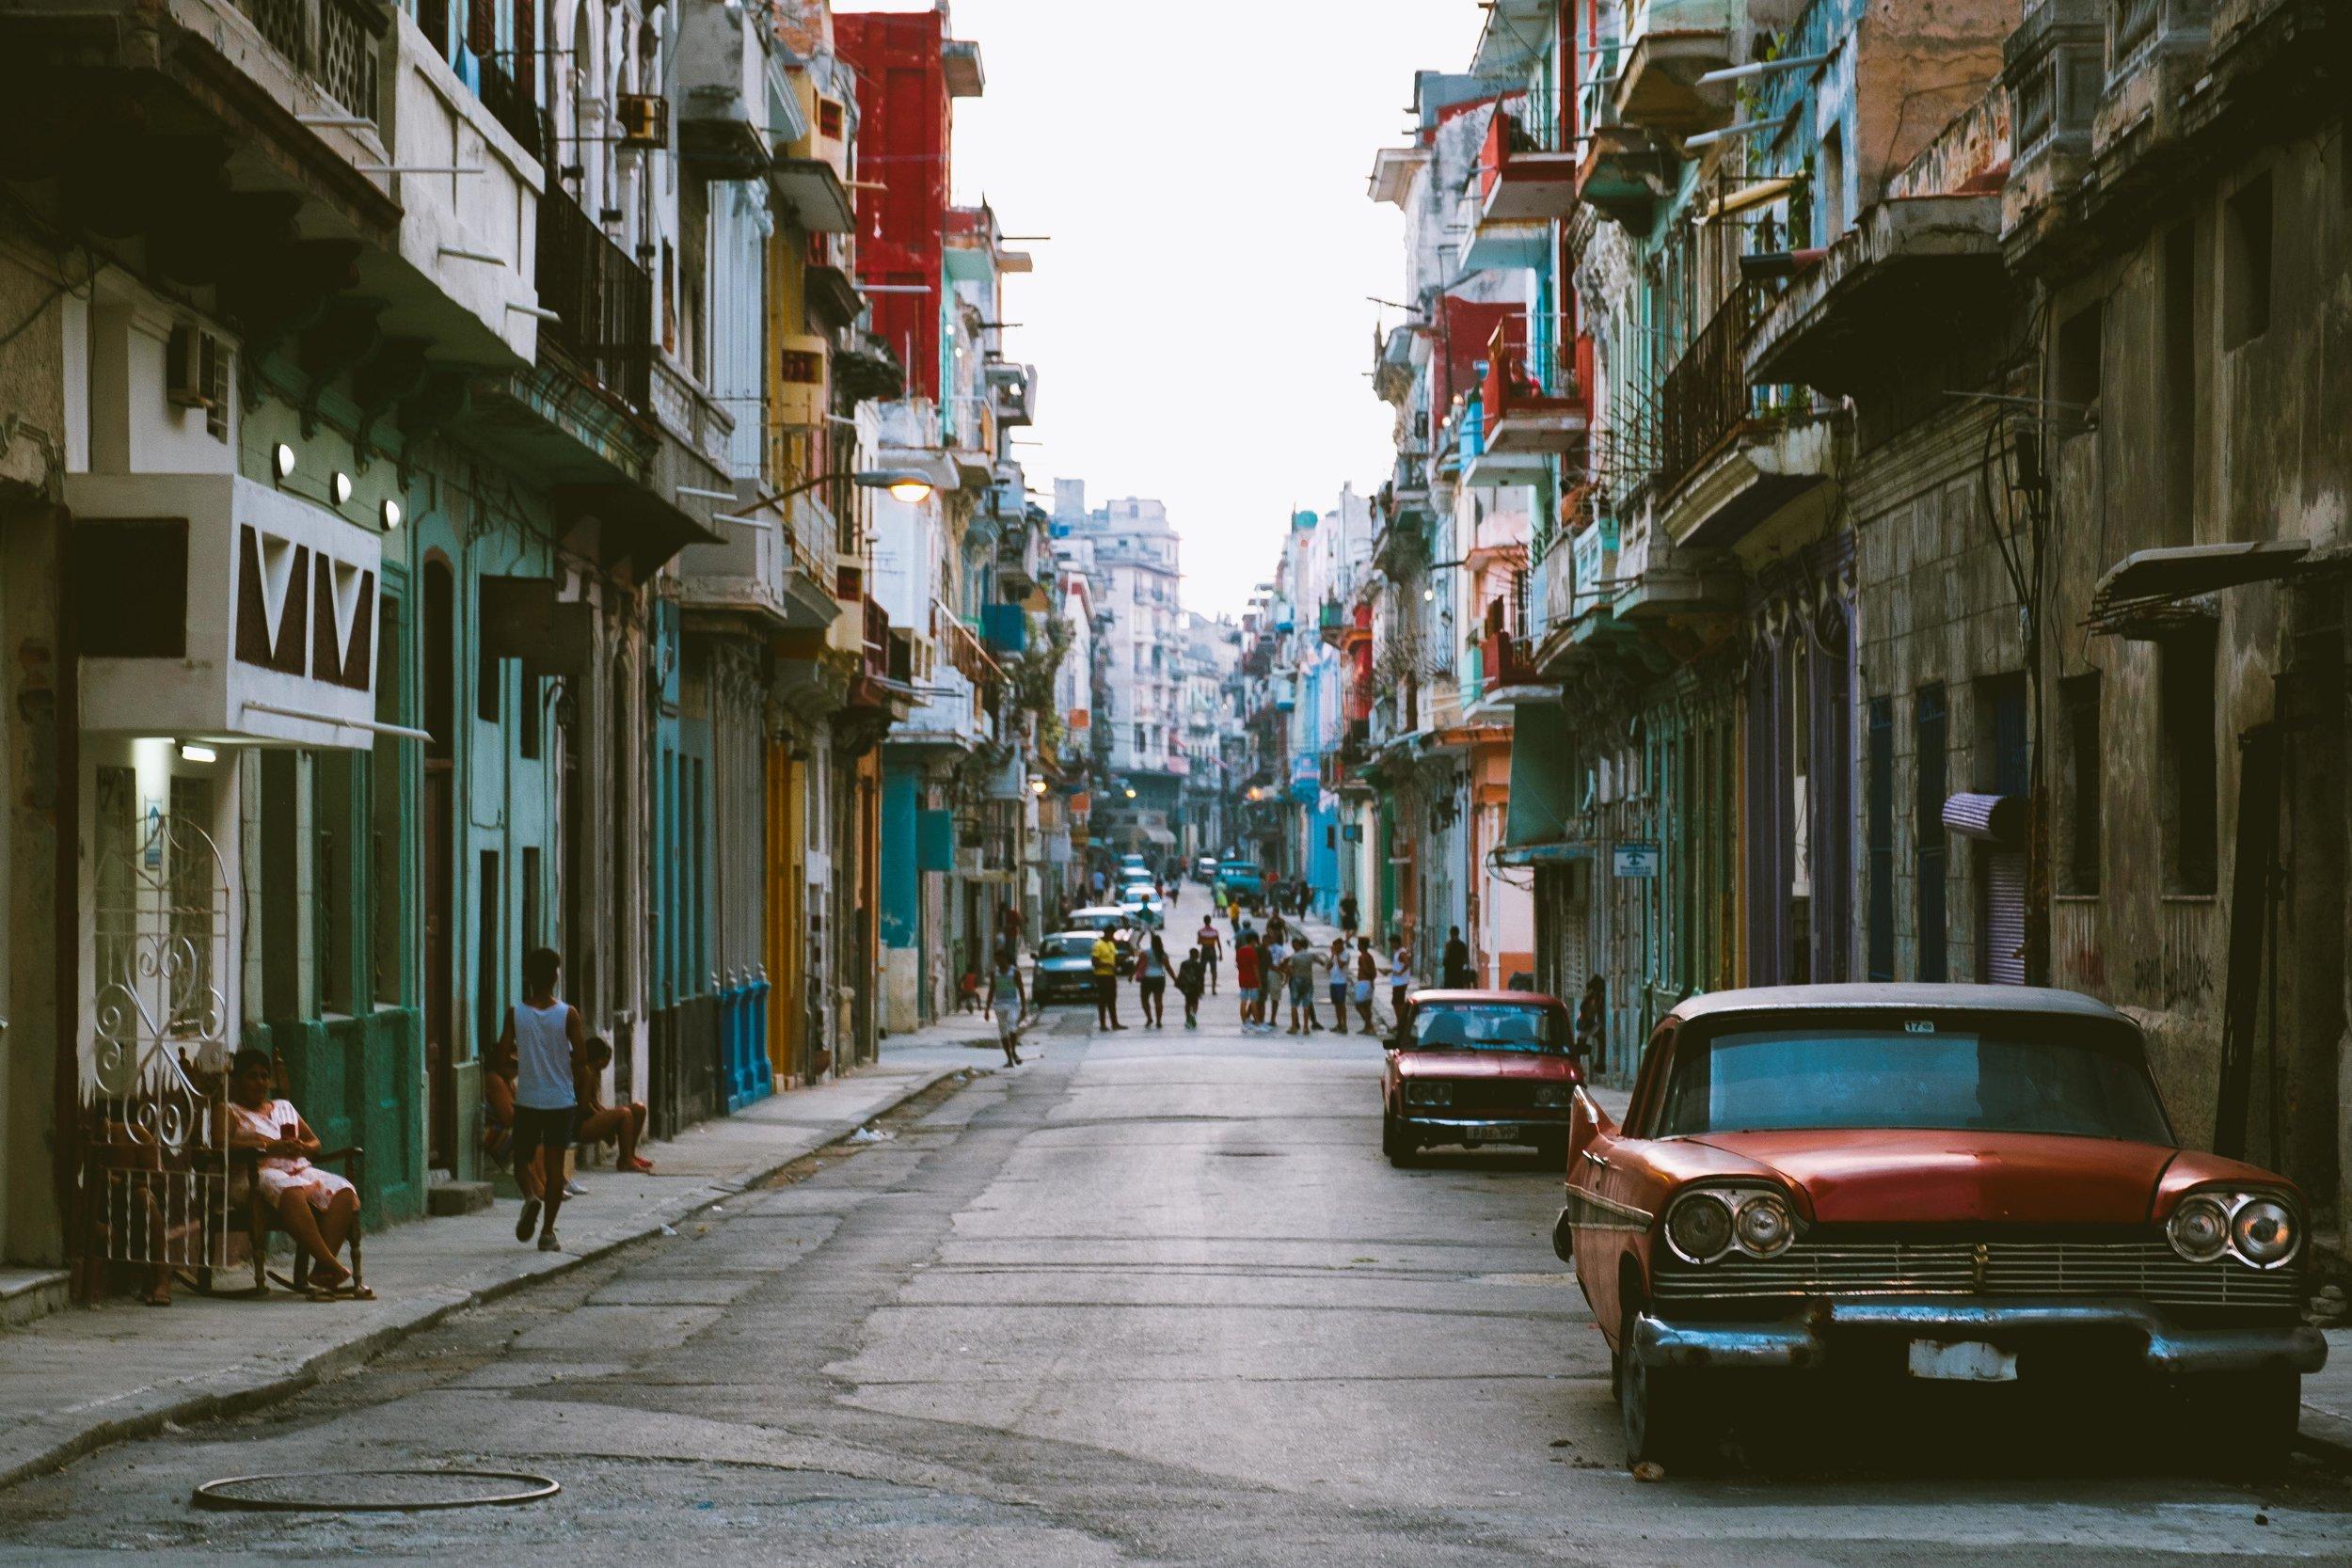 Cookwilltravel - Cuba - DSCF8828.jpg